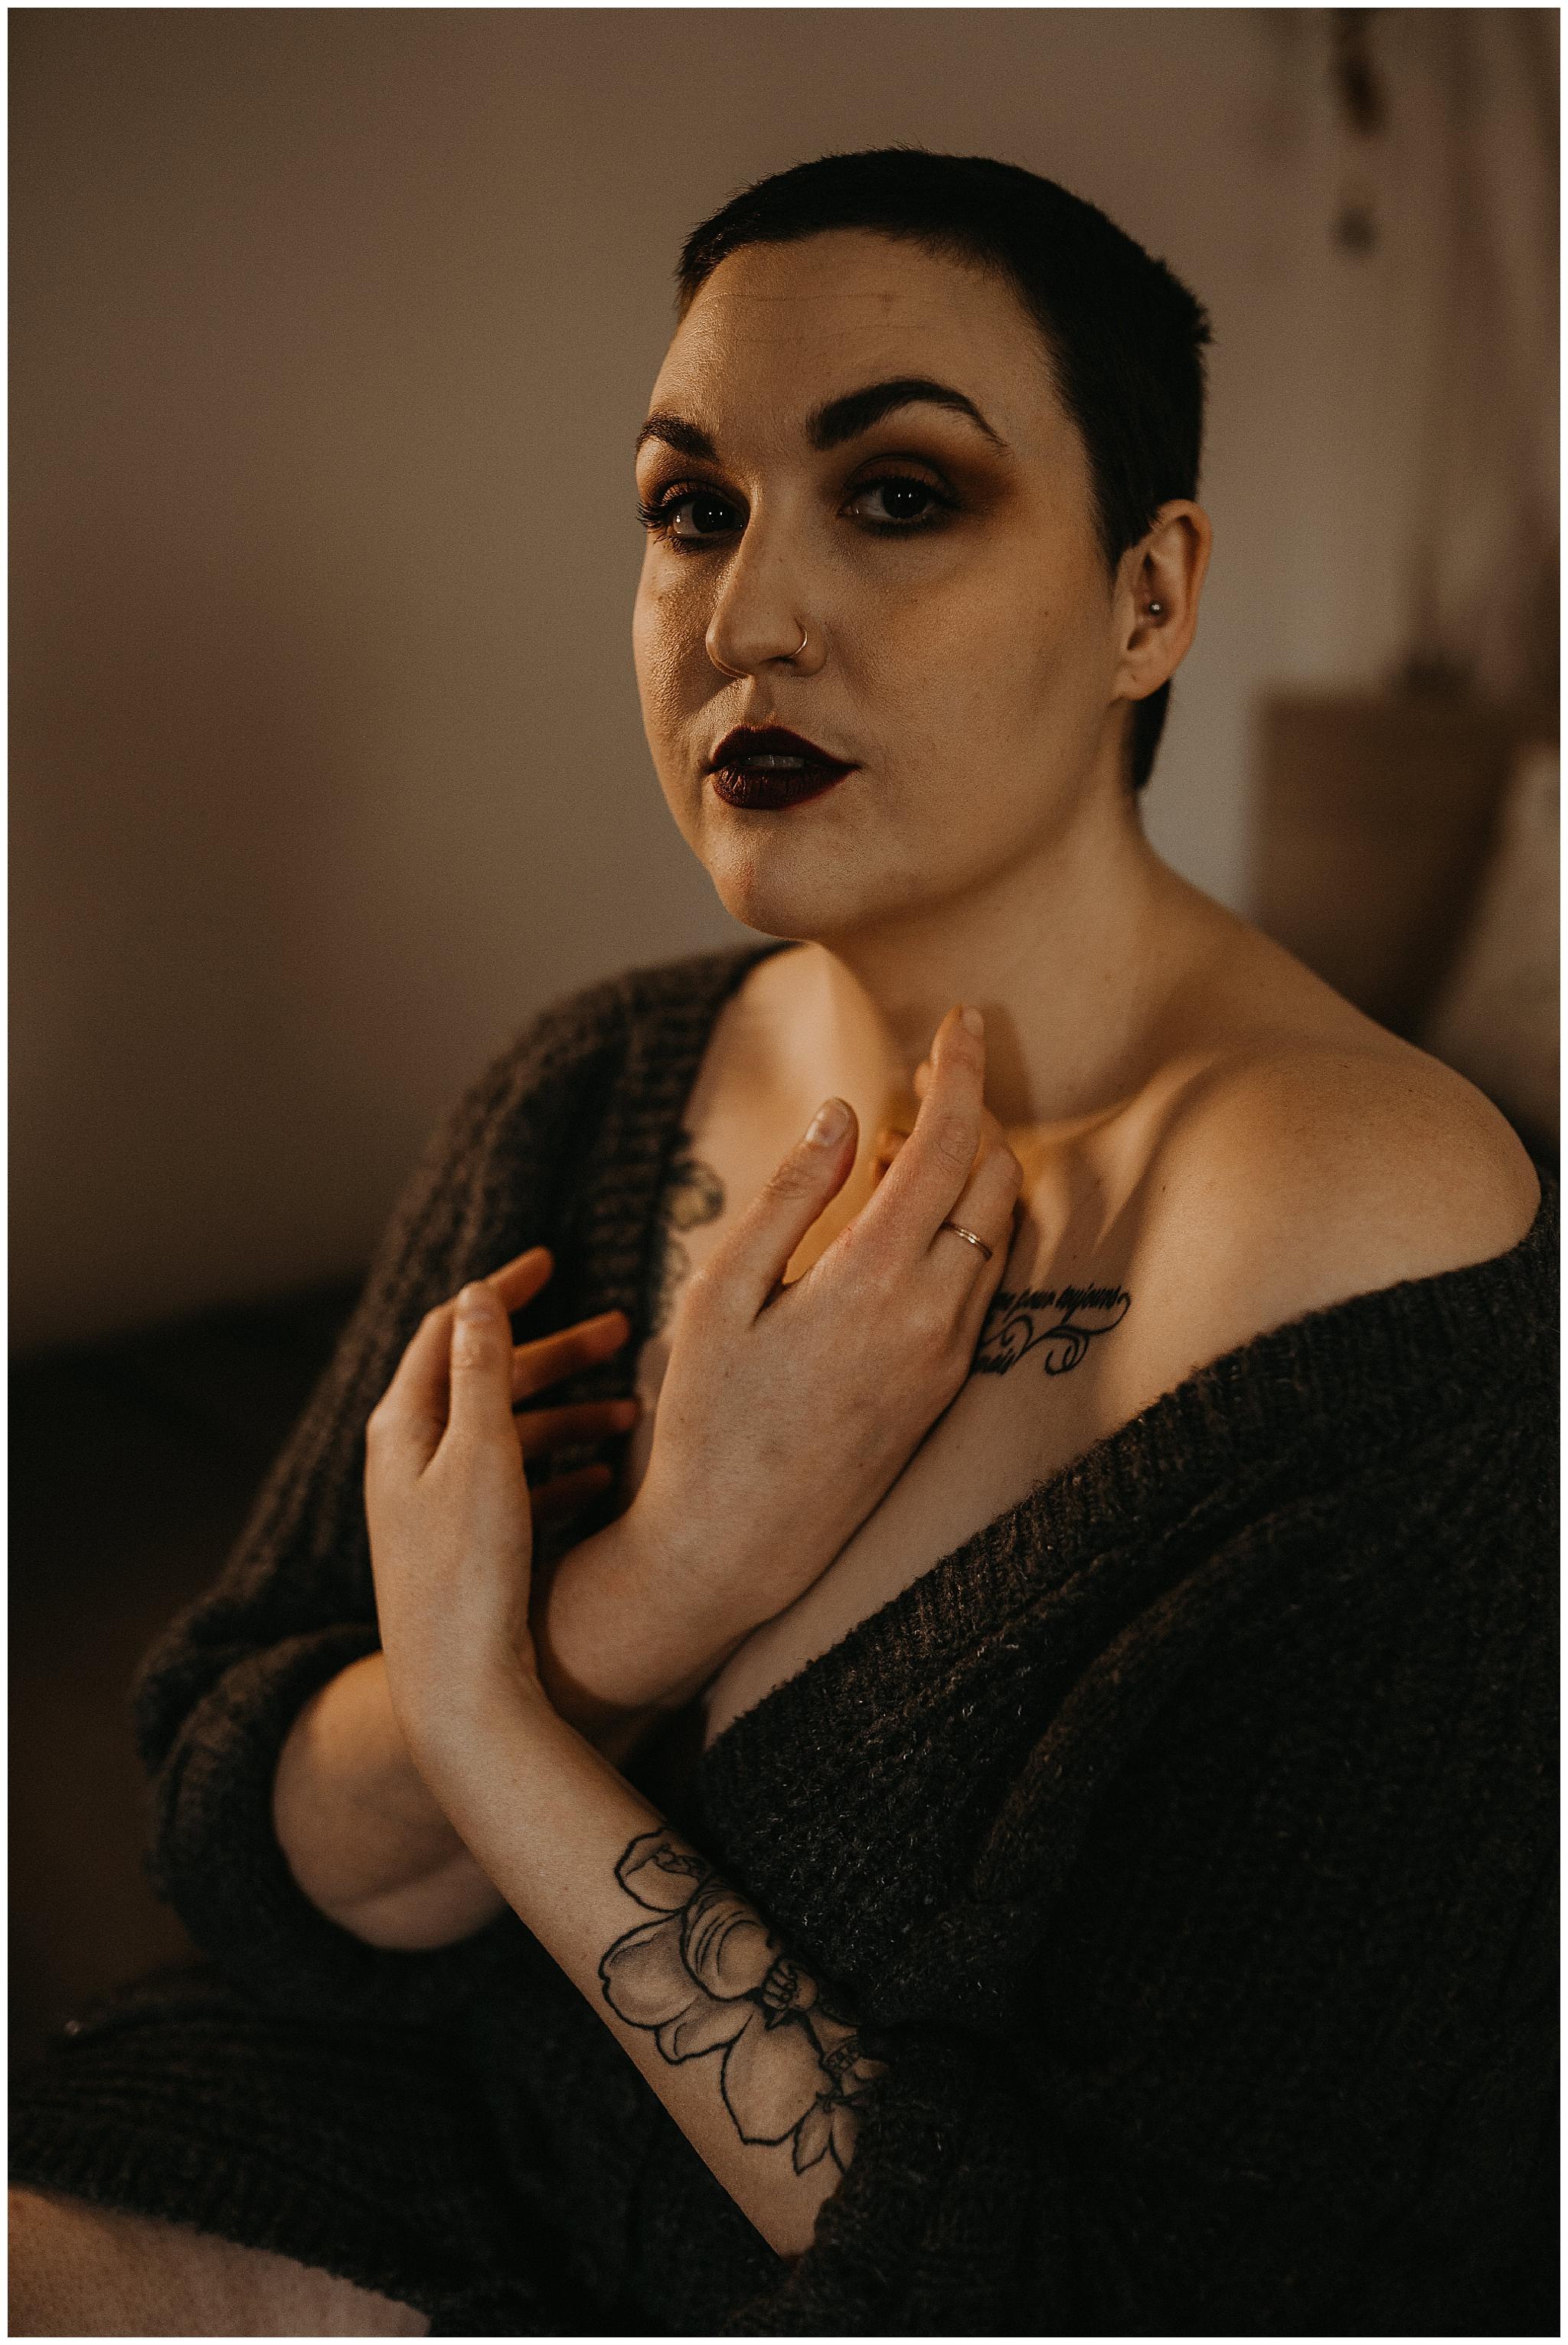 seatac-in-home-boudoir-portraits-kendall-fat-babe-boudoir24.jpg